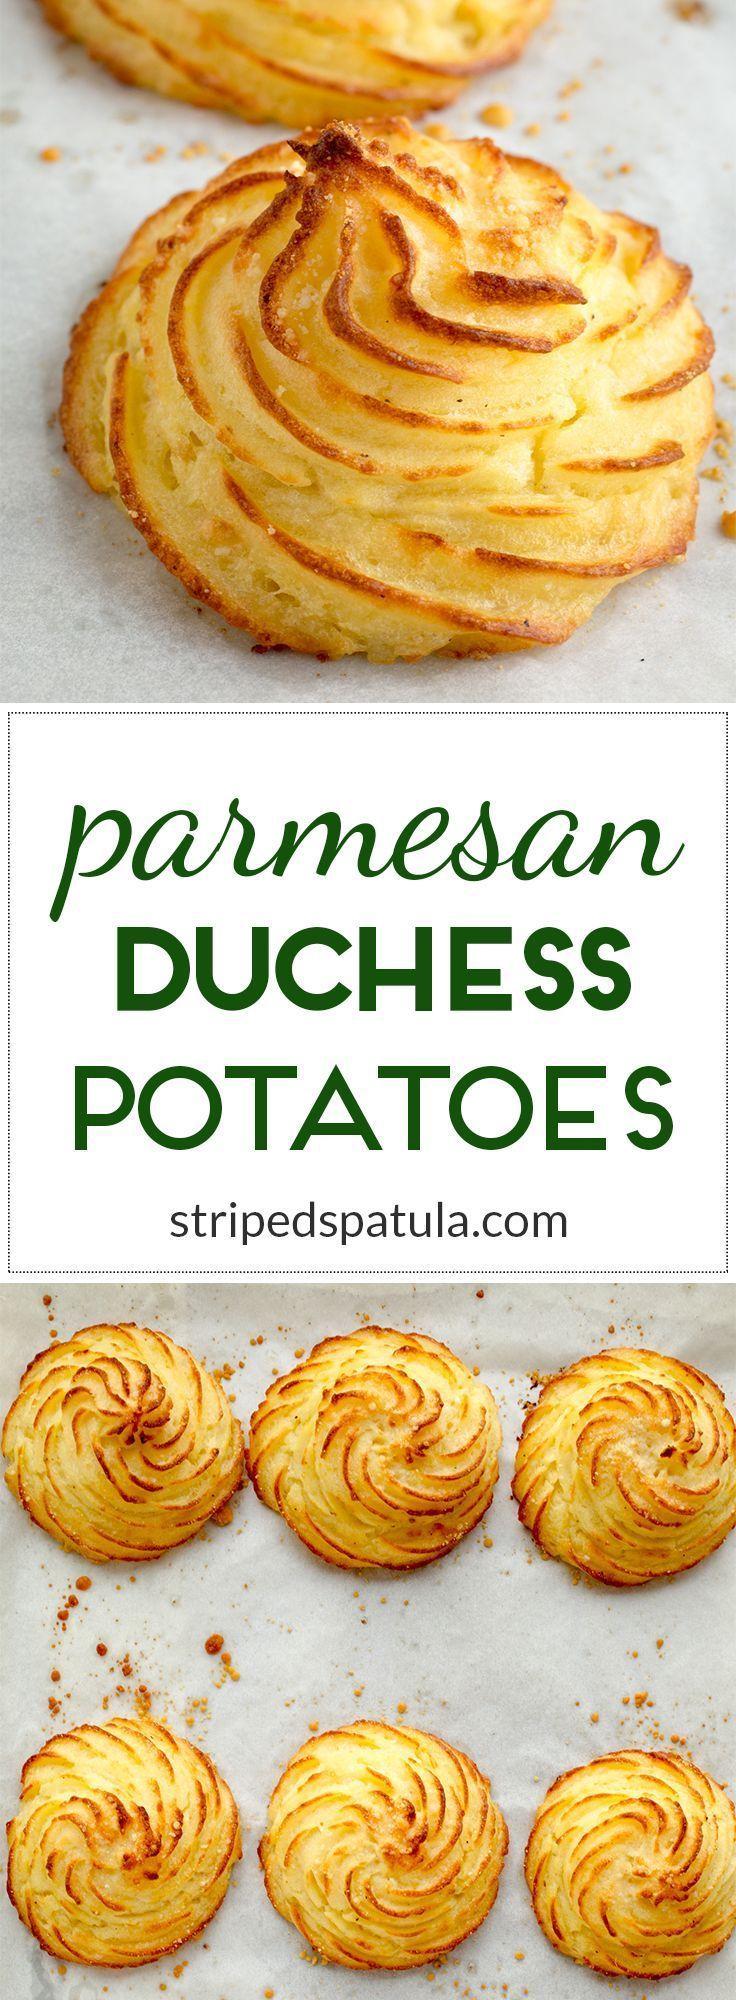 Photo of Duchess Potatoes Recipe with Parmesan | Striped Spatula